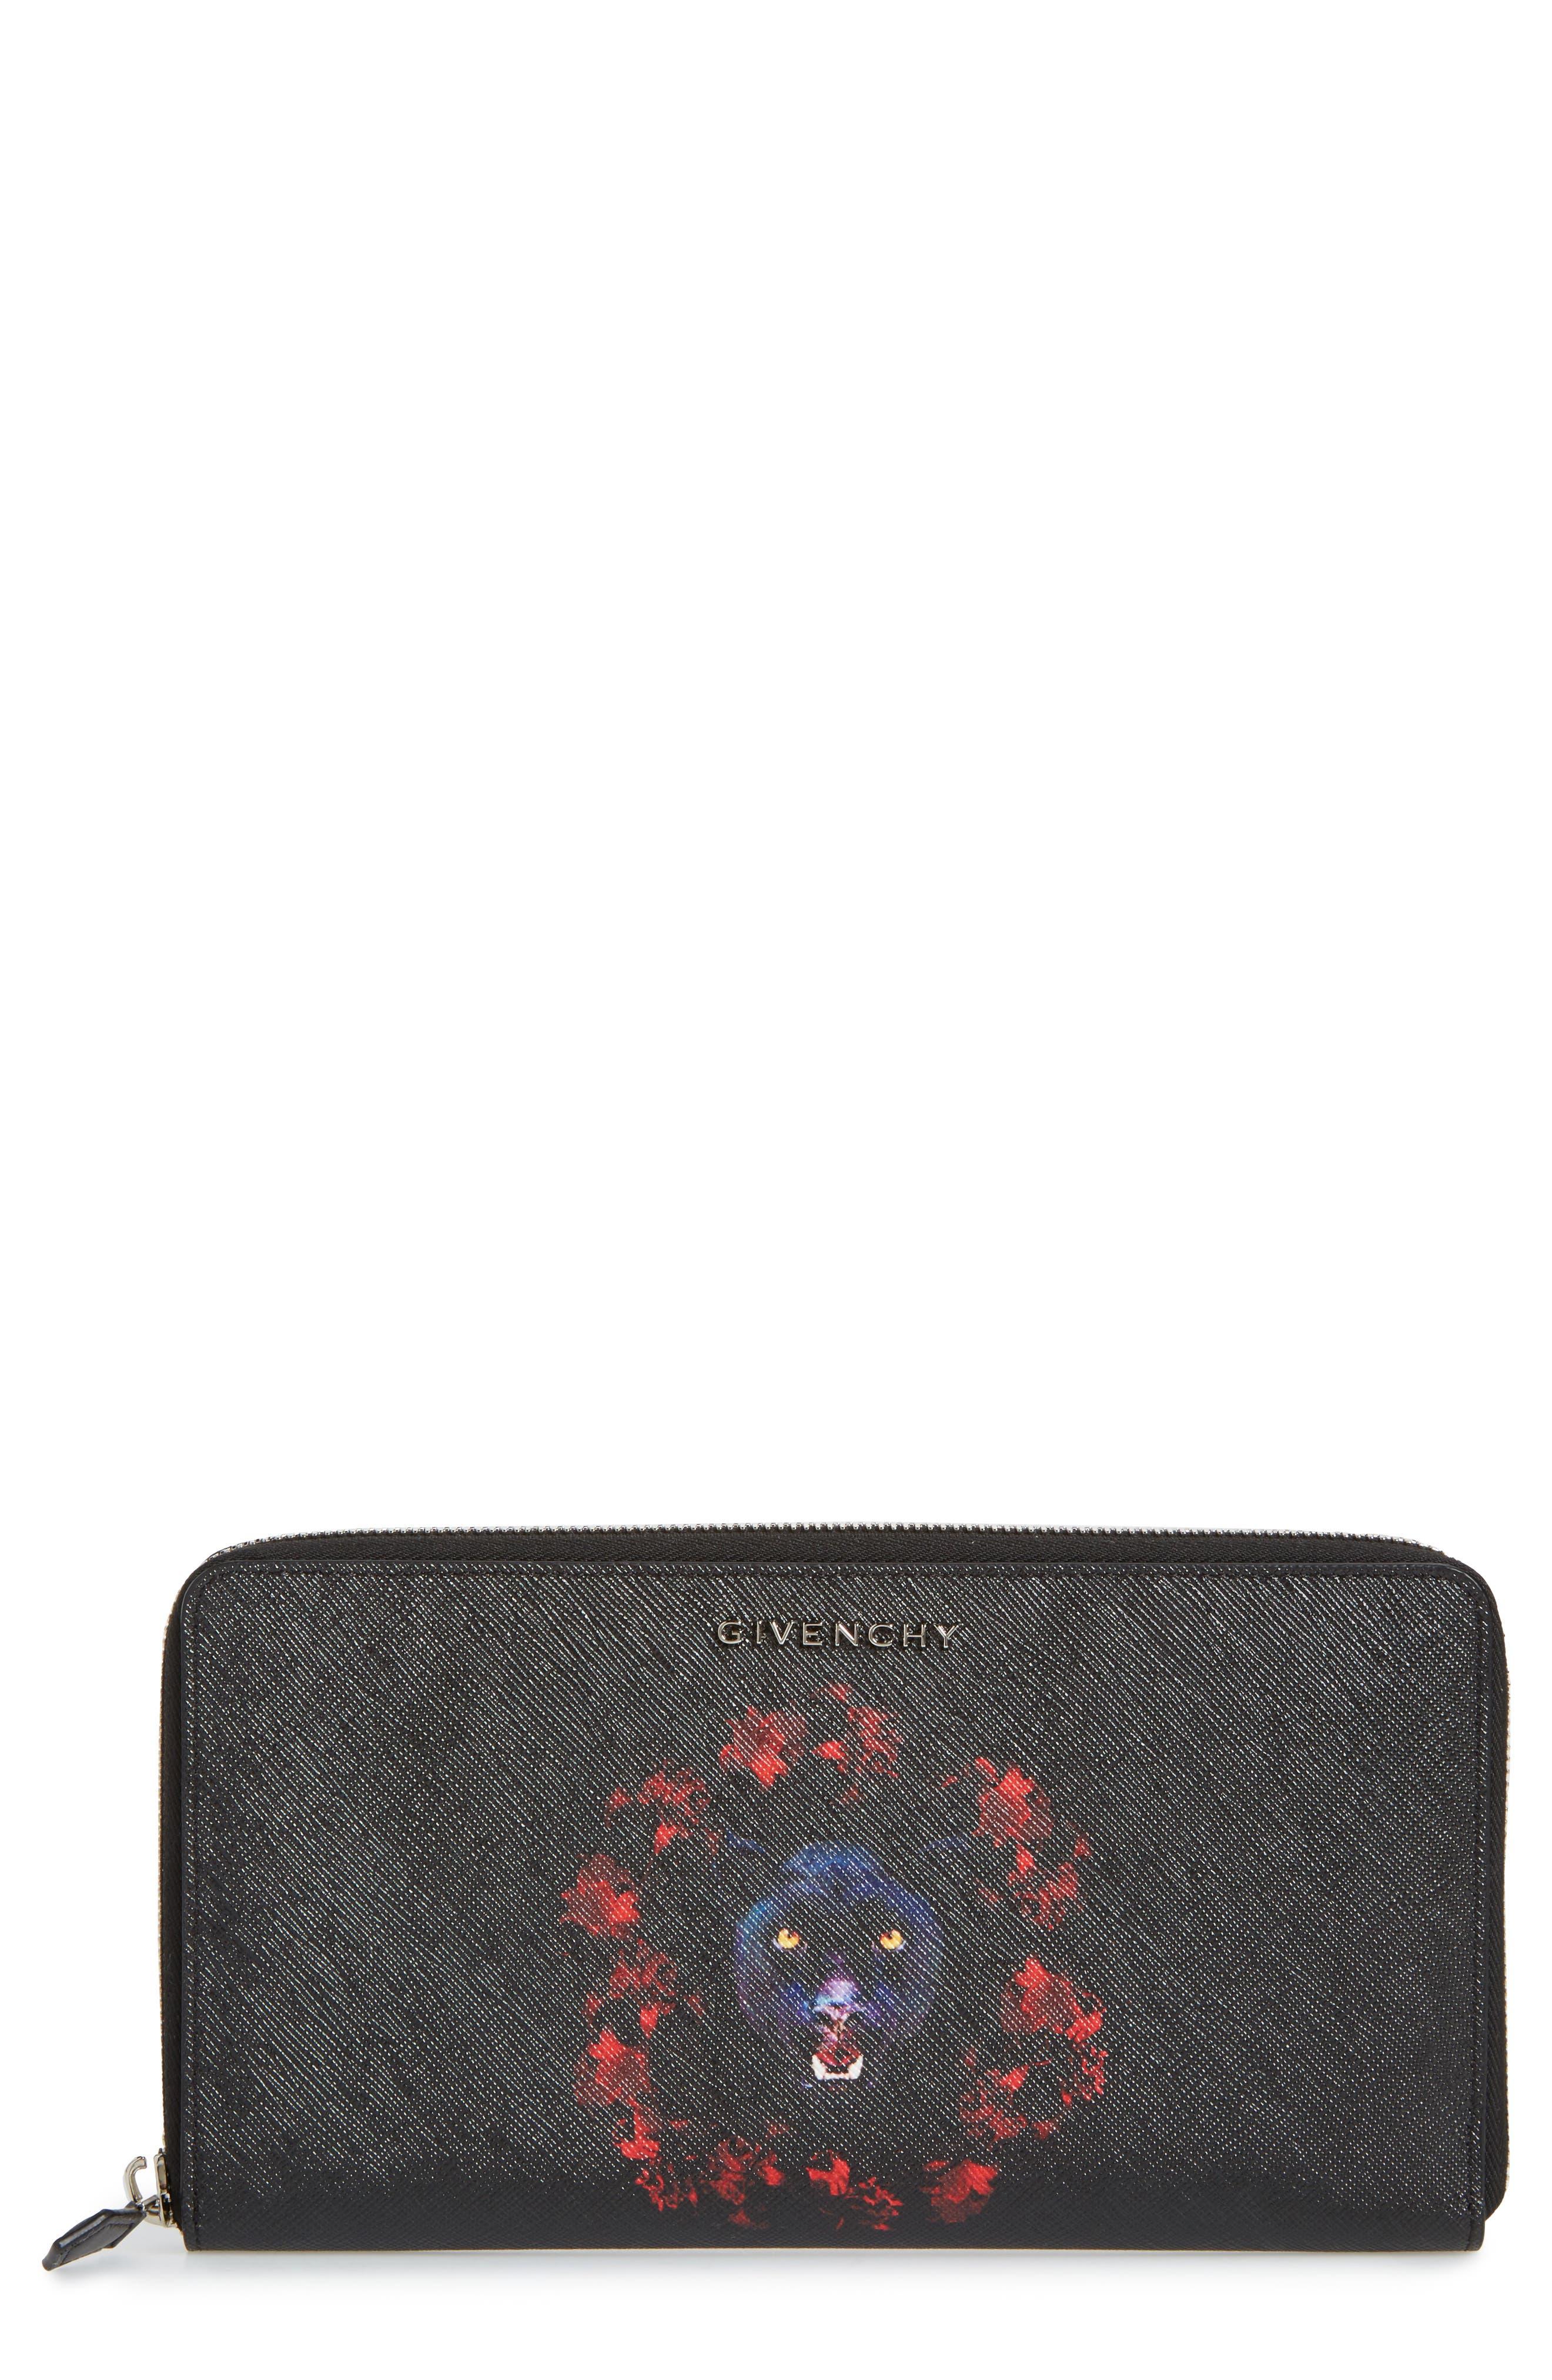 Main Image - Givenchy Jaguar Zip-Around Wallet